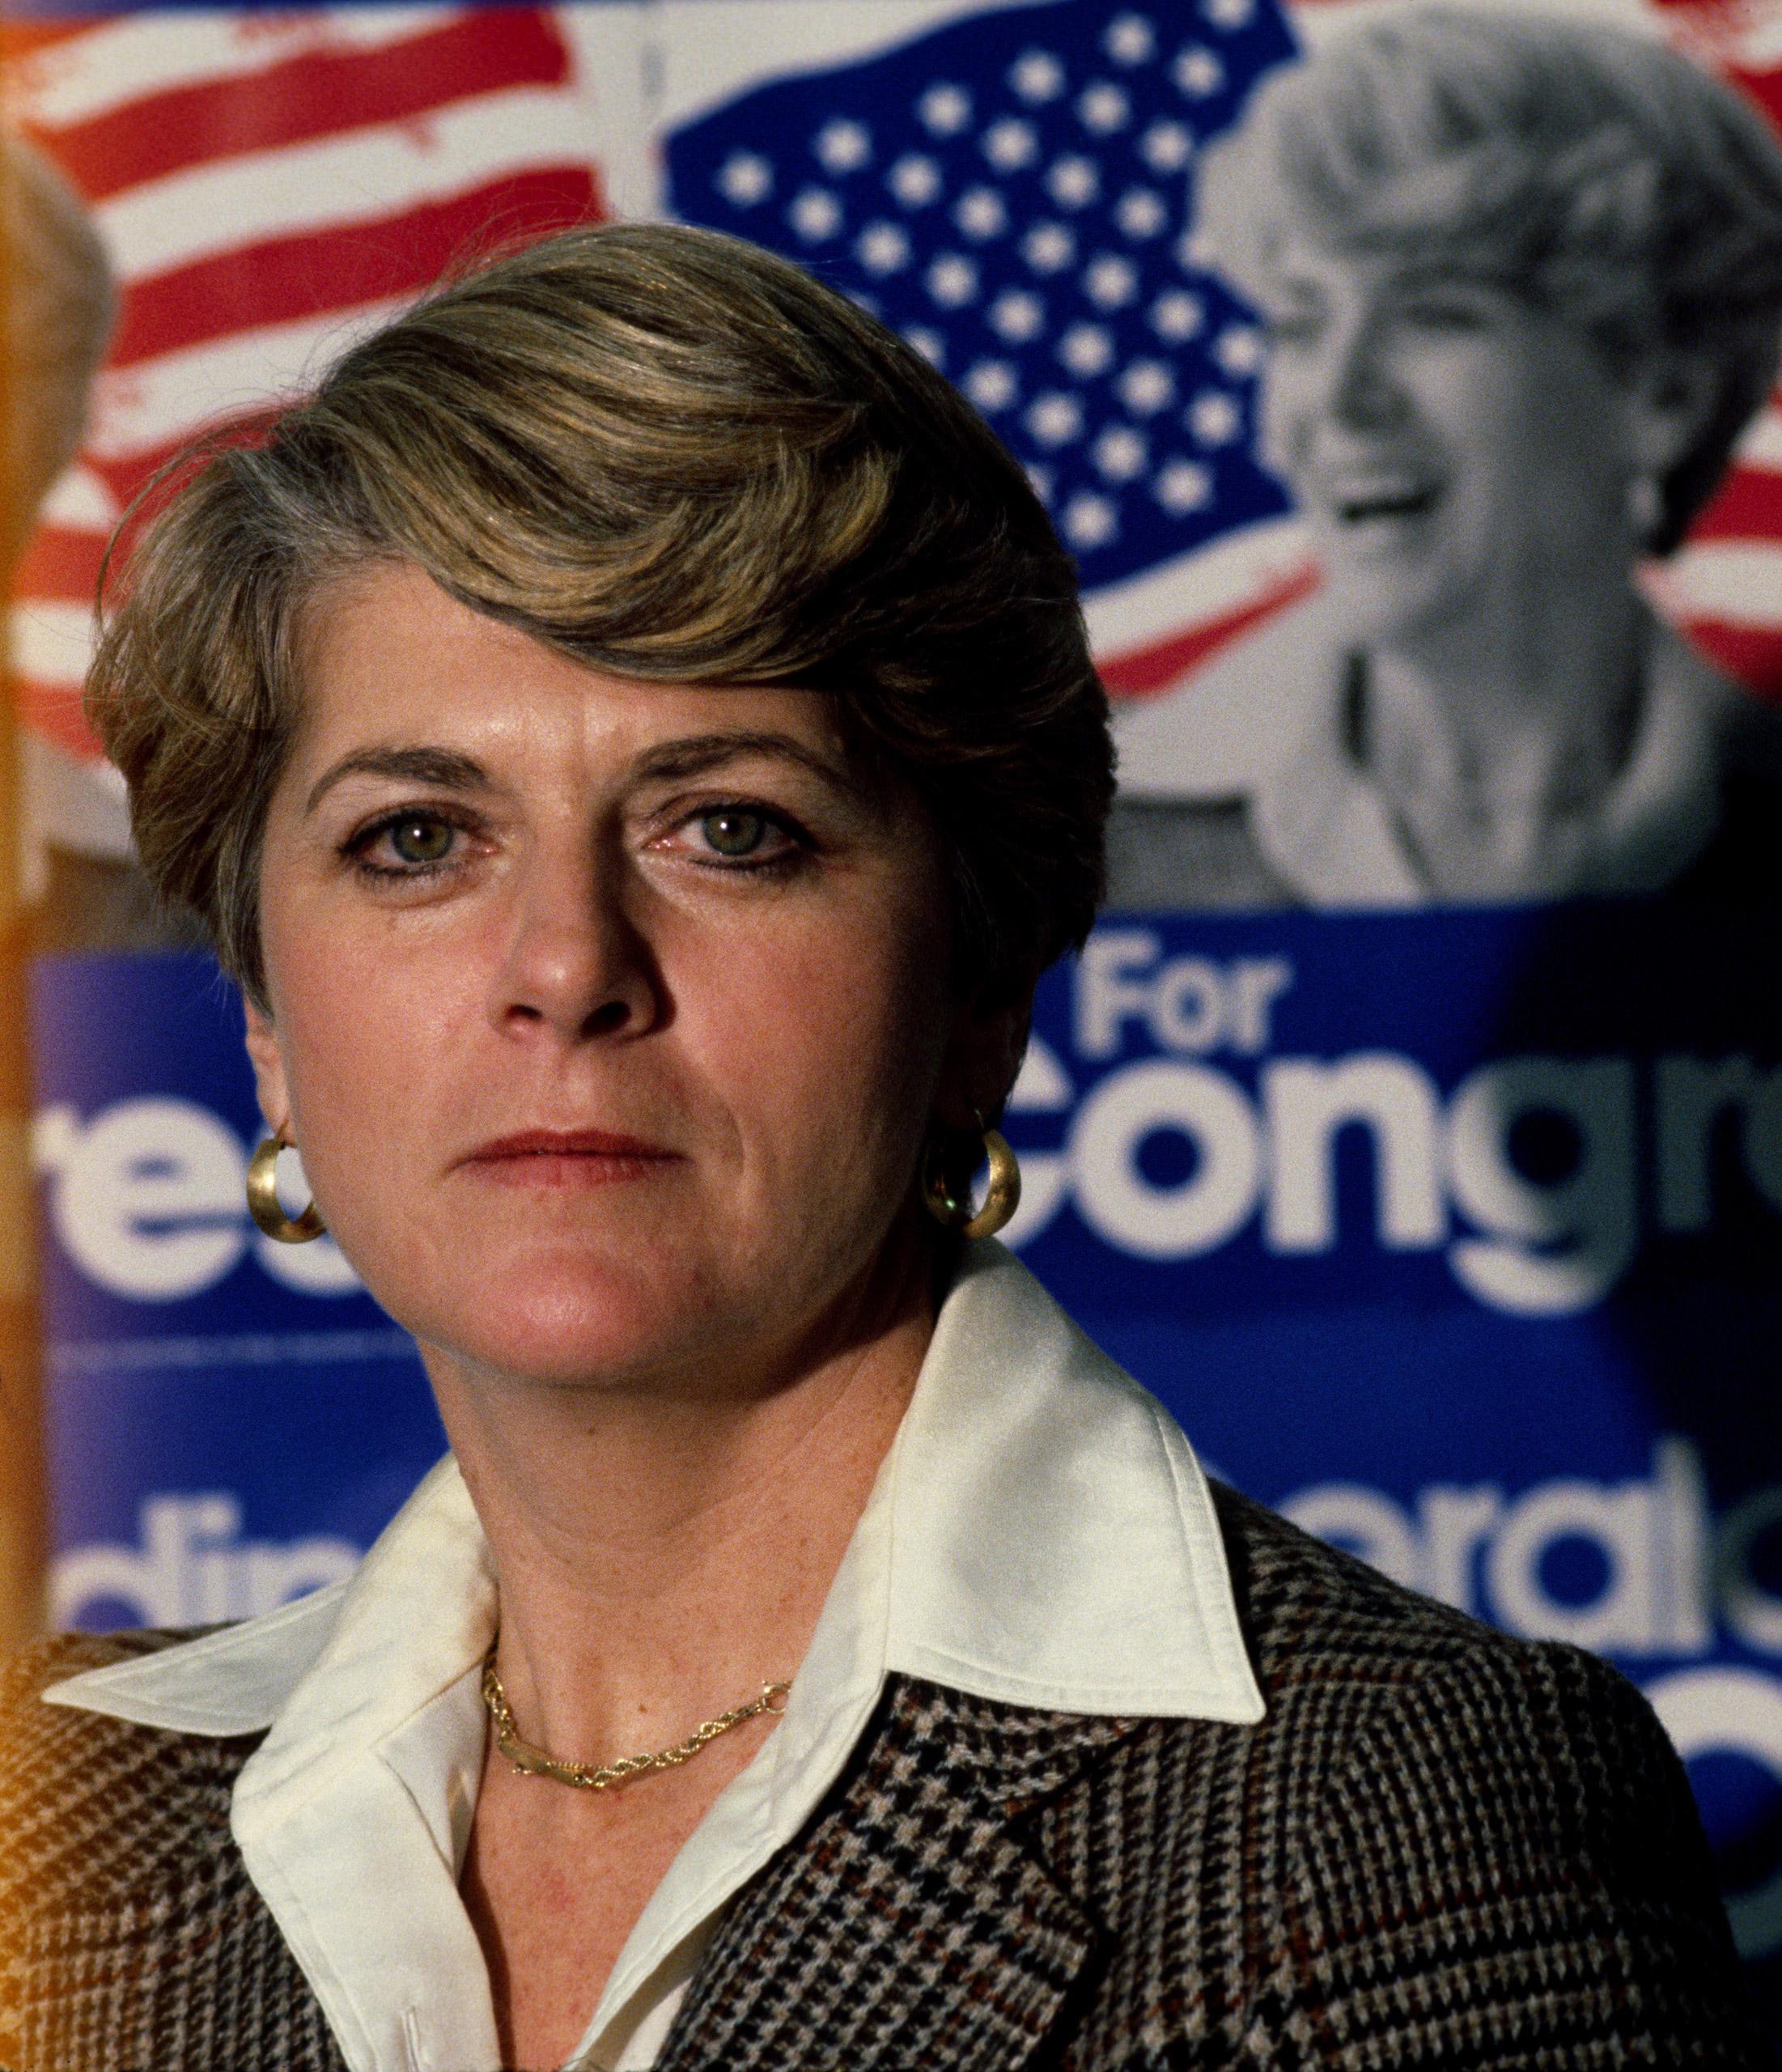 Geraldine Ferraro on February 3, 1979 in New York, New York.